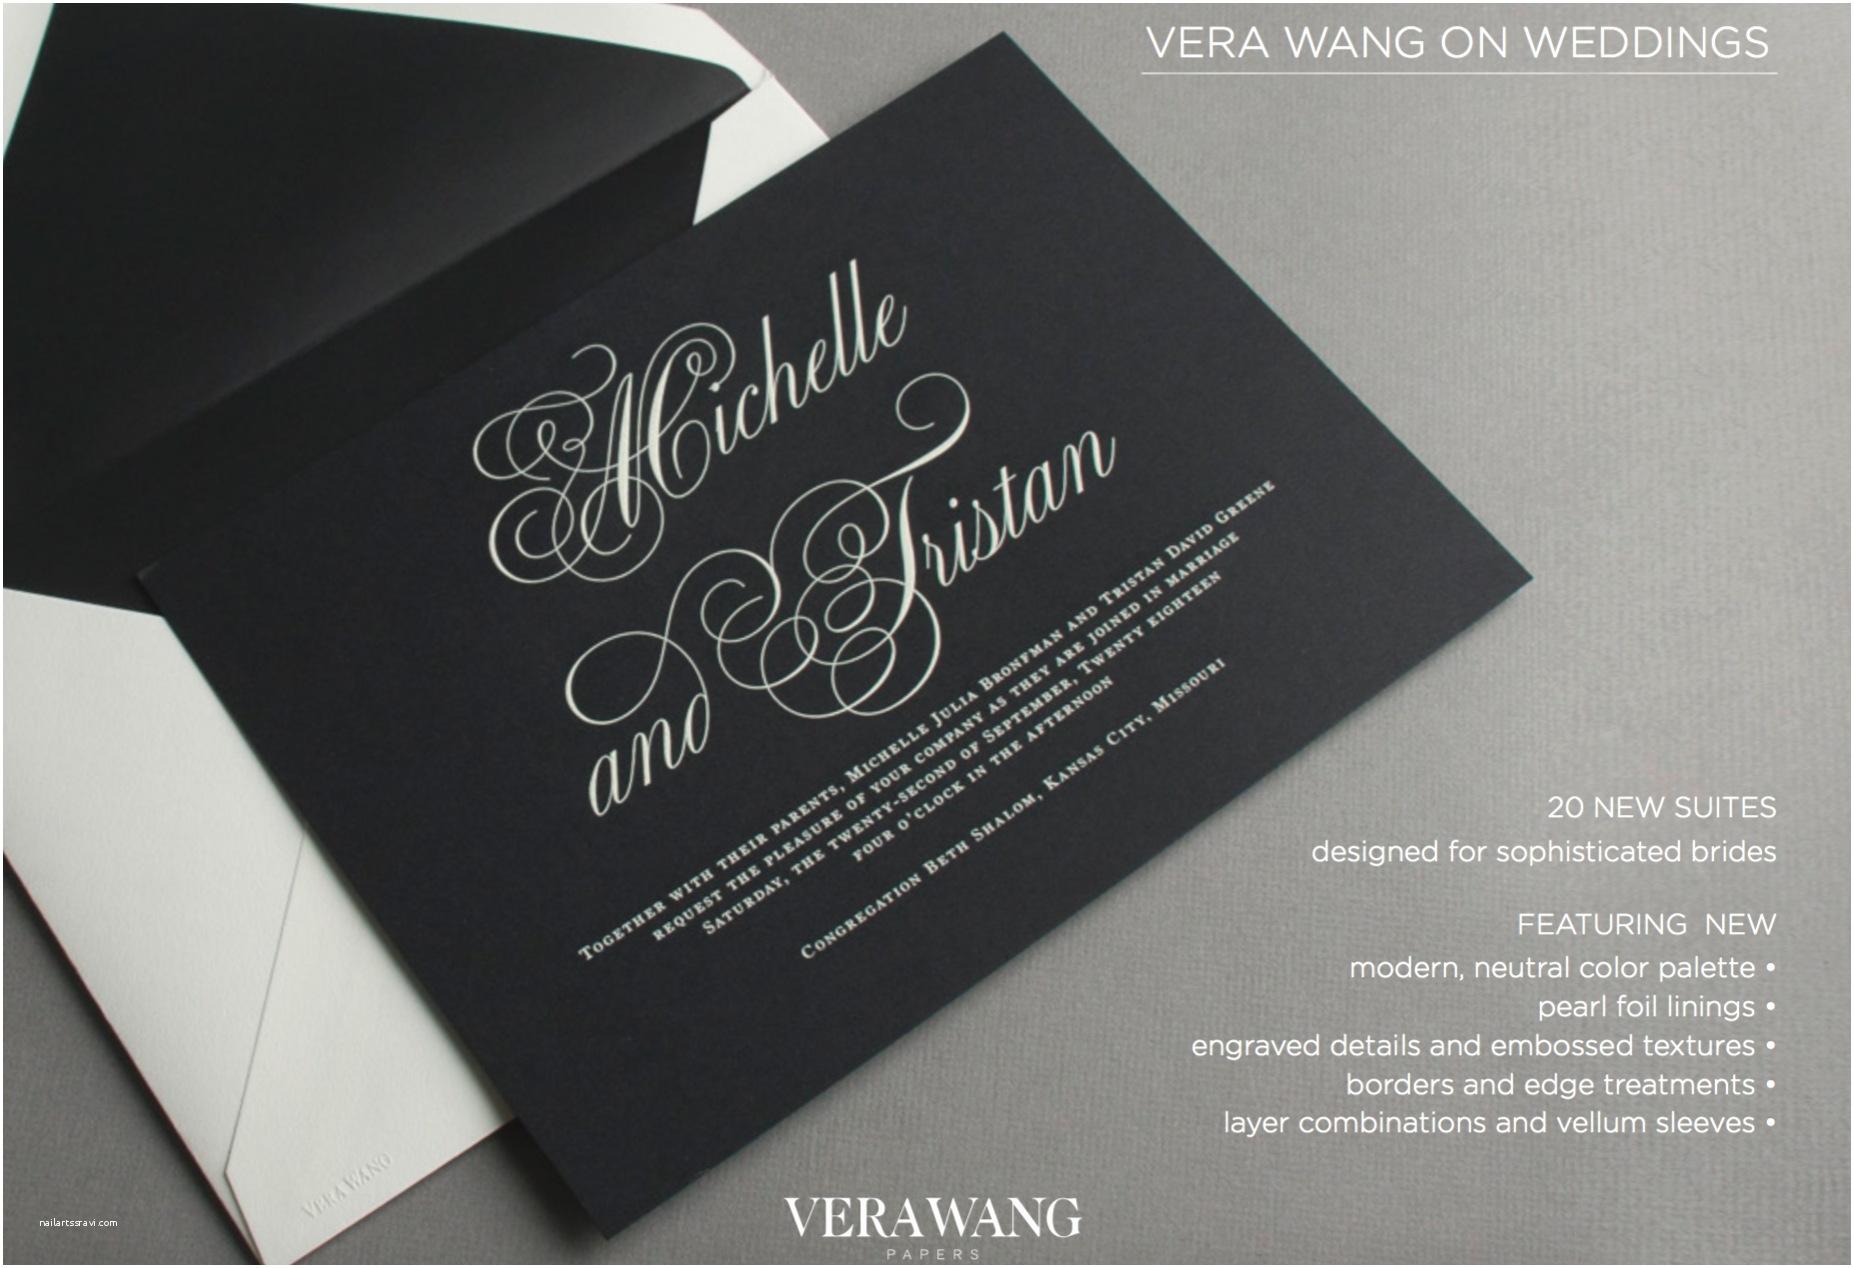 Vera Wang Wedding Invitations Wedding Invitations Custom Letterpress and Other Fine